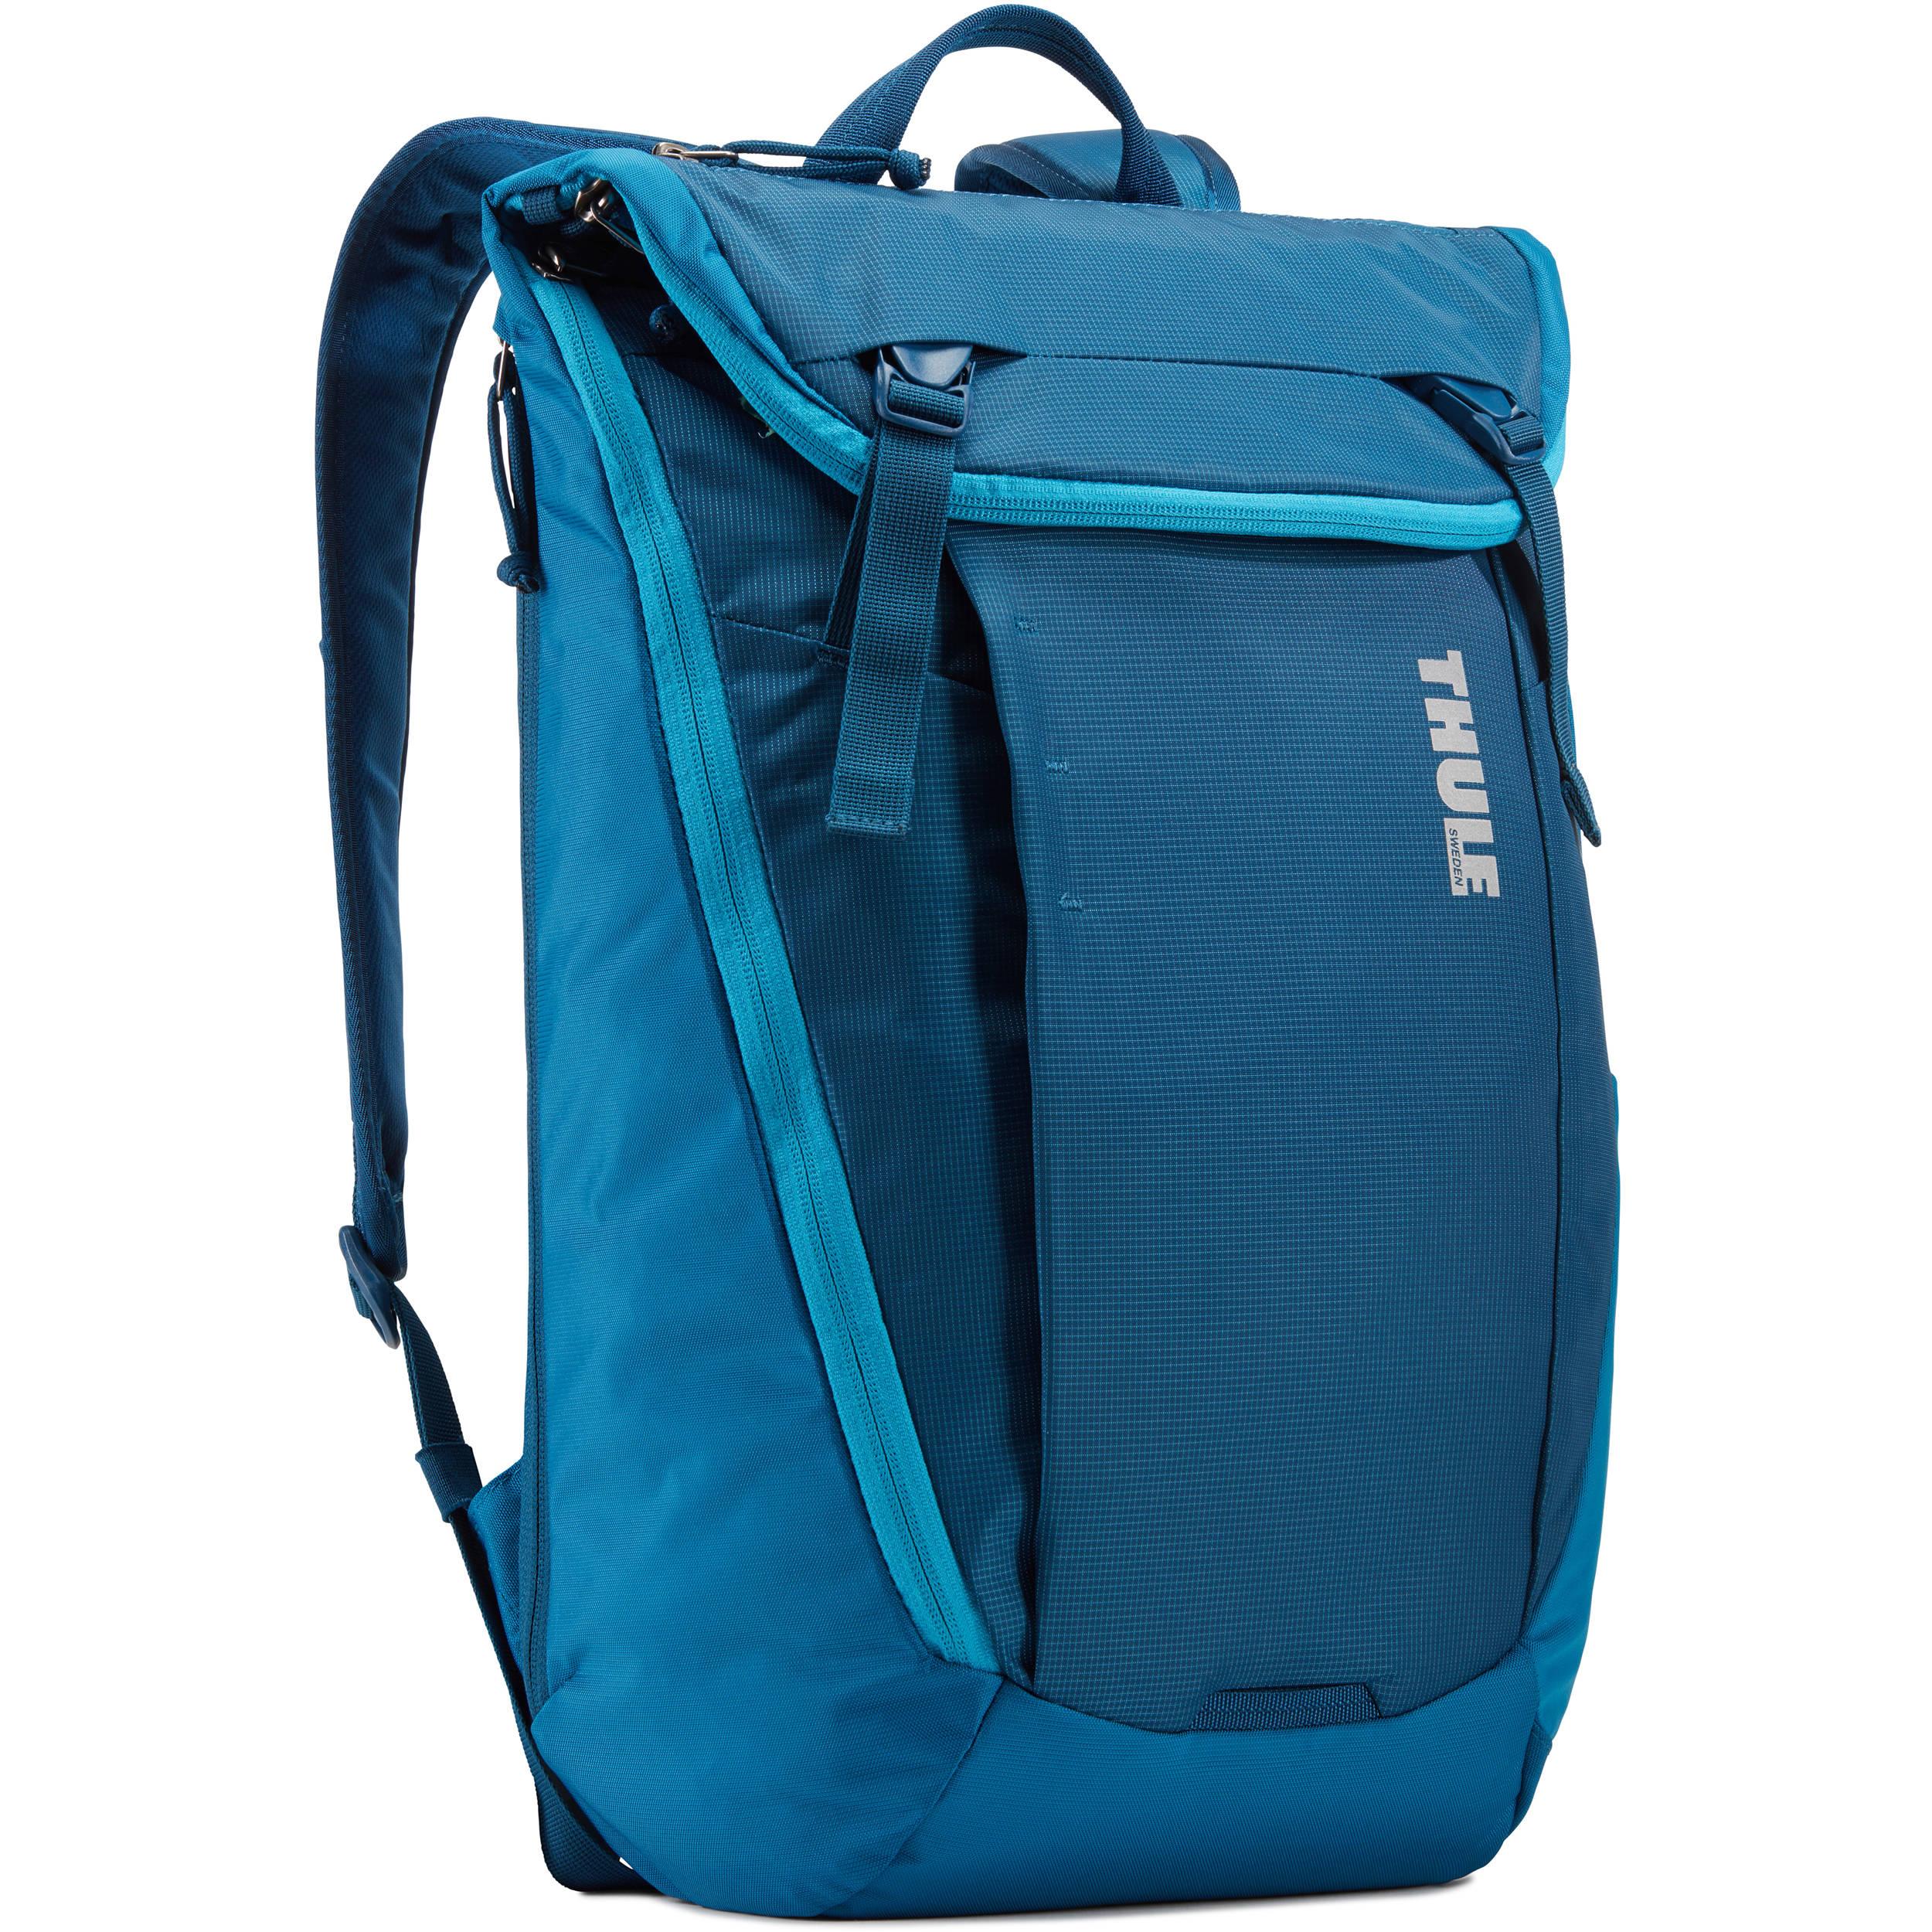 02479b4a5245 Thule EnRoute 20L Backpack (Poseidon) 3203595 B H Photo Video